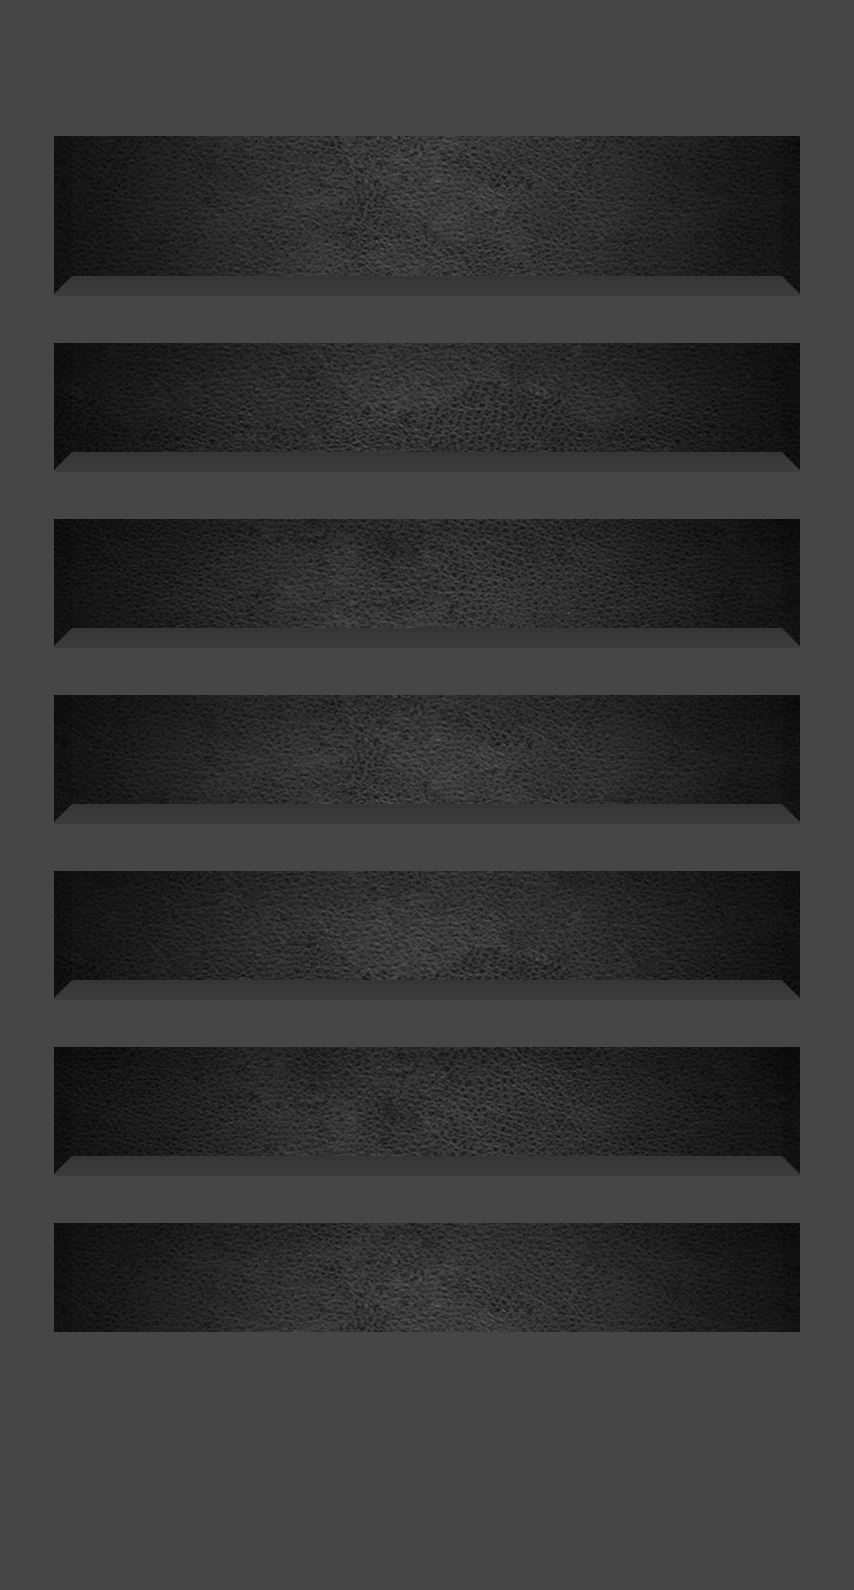 Shelf Wood Simple Black Wallpaper Sc Iphone7